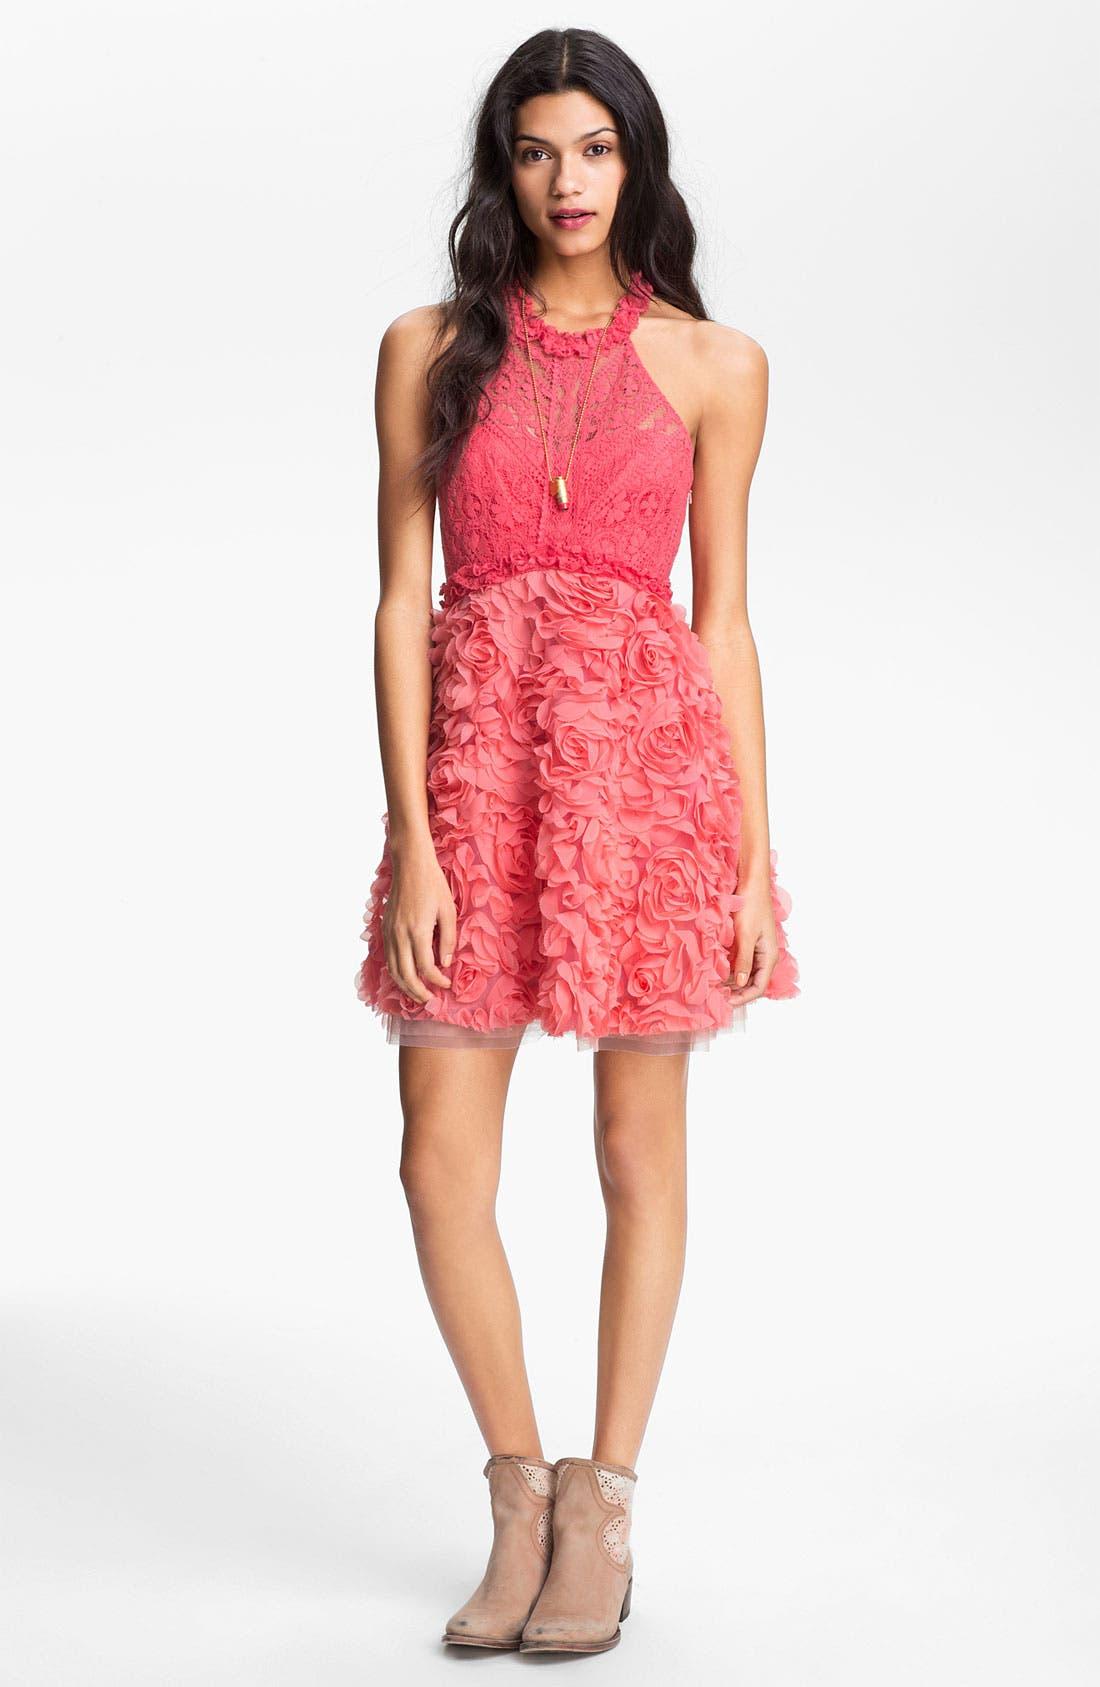 Main Image - Free People 'Bouquet' Lace & Rosette Dress